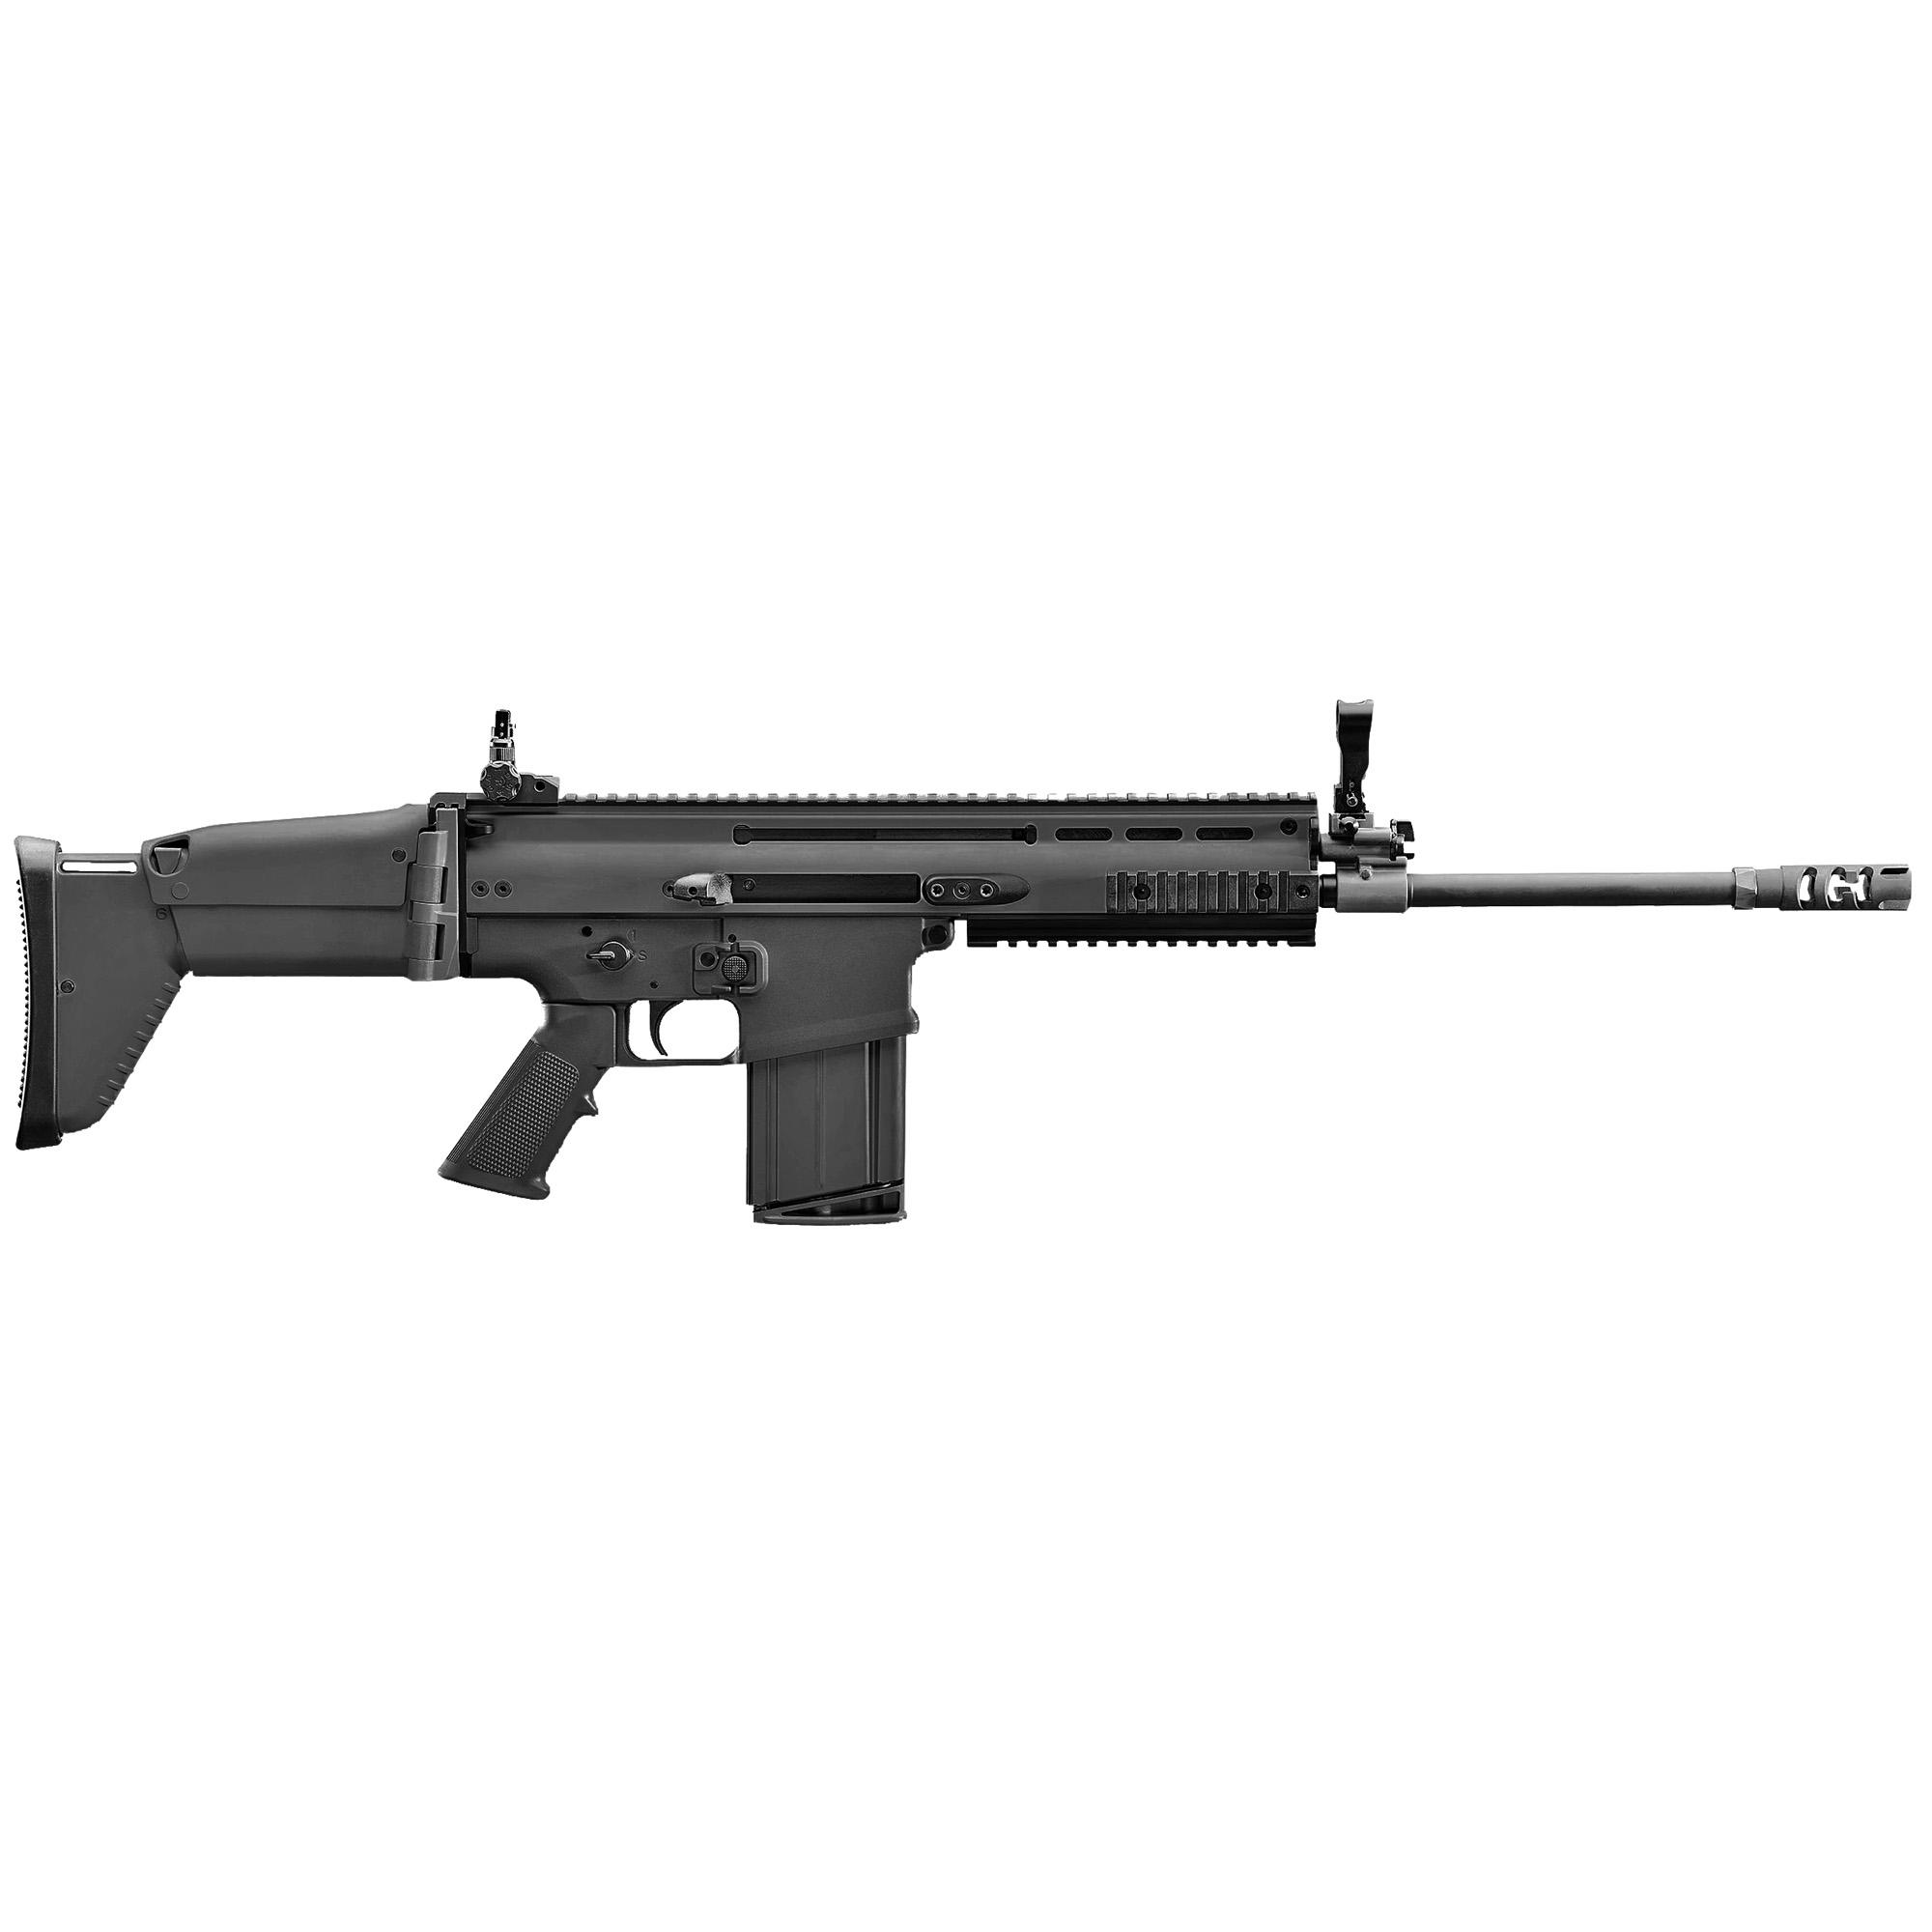 FN America Fn Scar 17s 308win 16